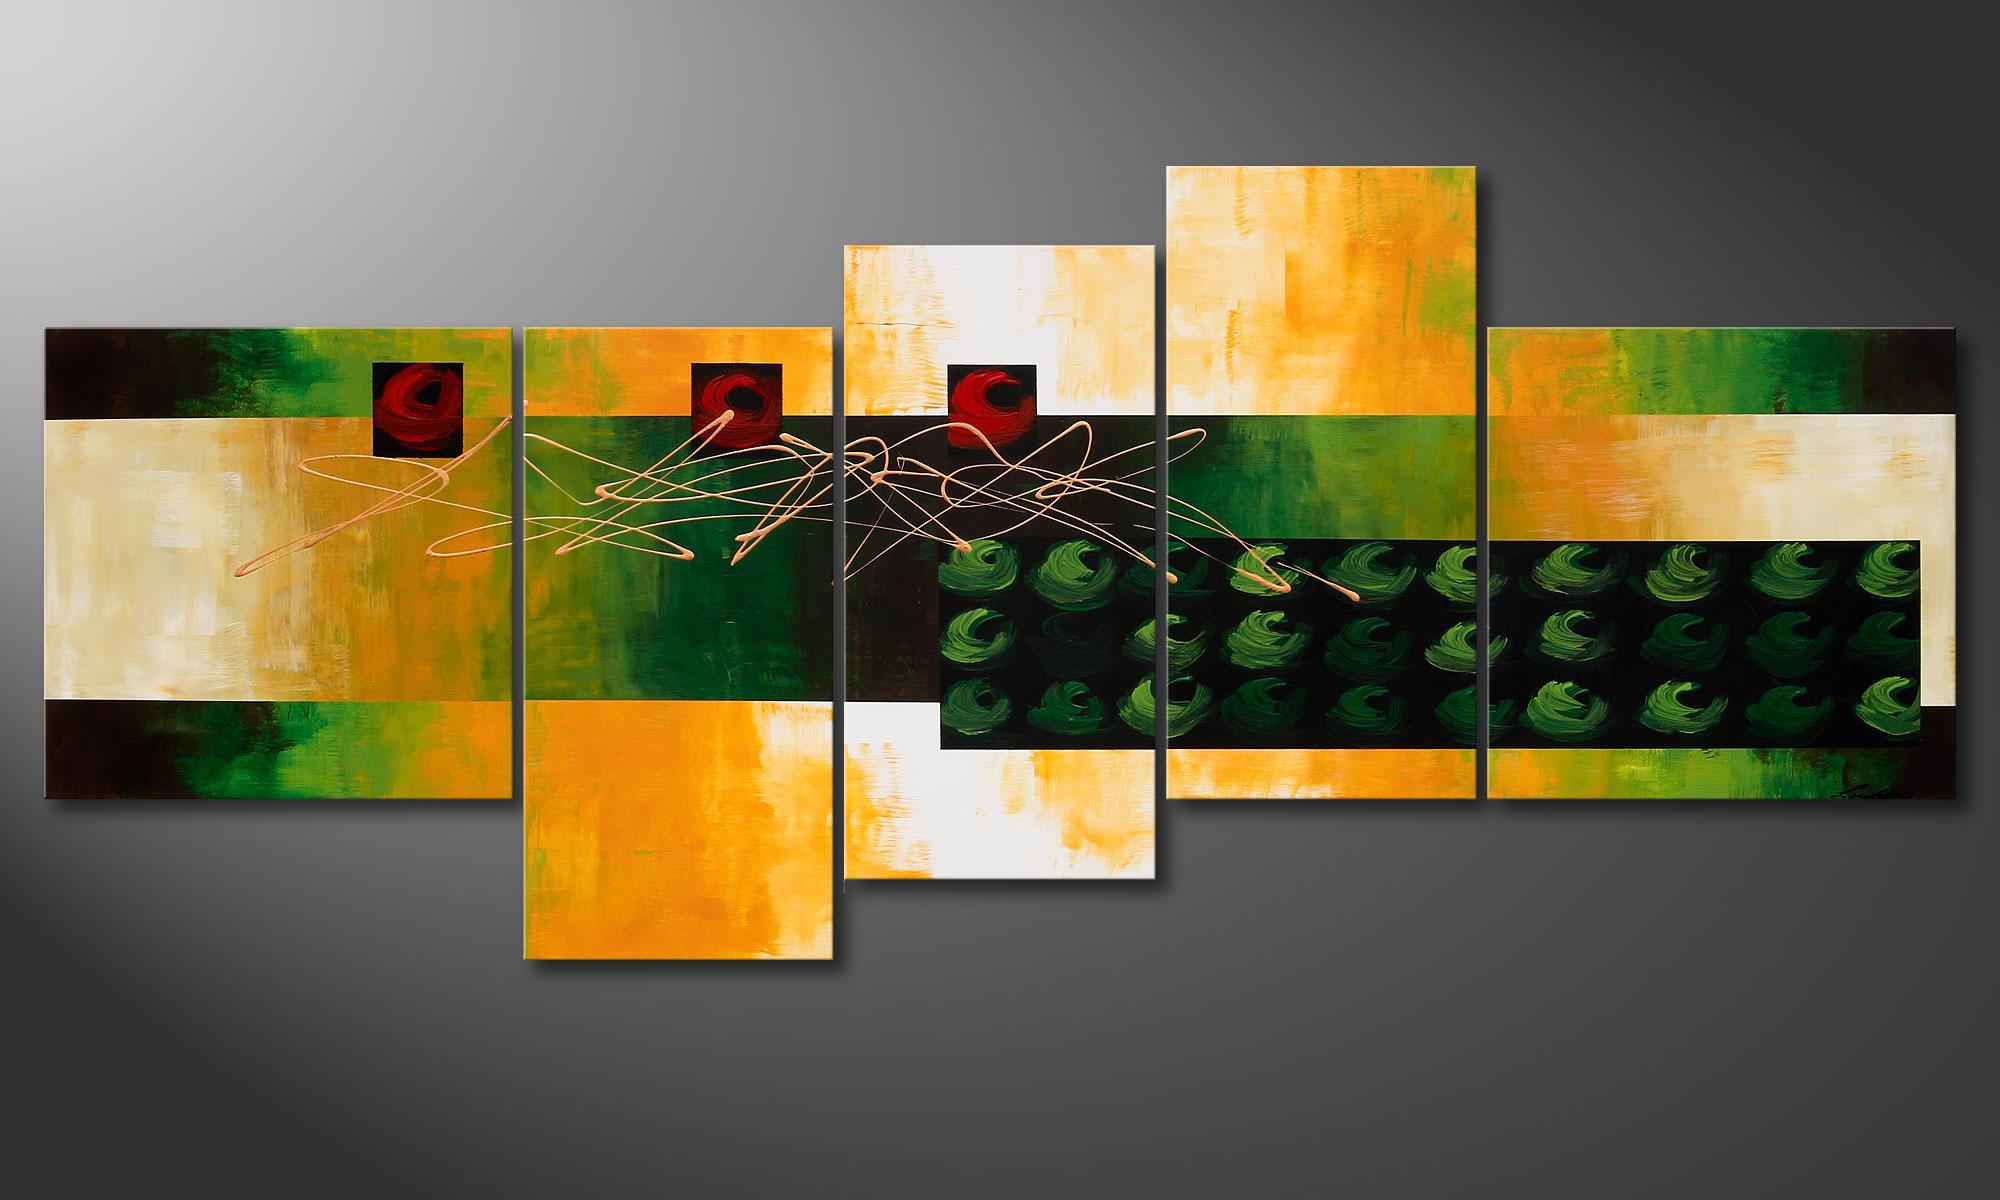 wandbilder wohnzimmer xxl | jtleigh - hausgestaltung ideen